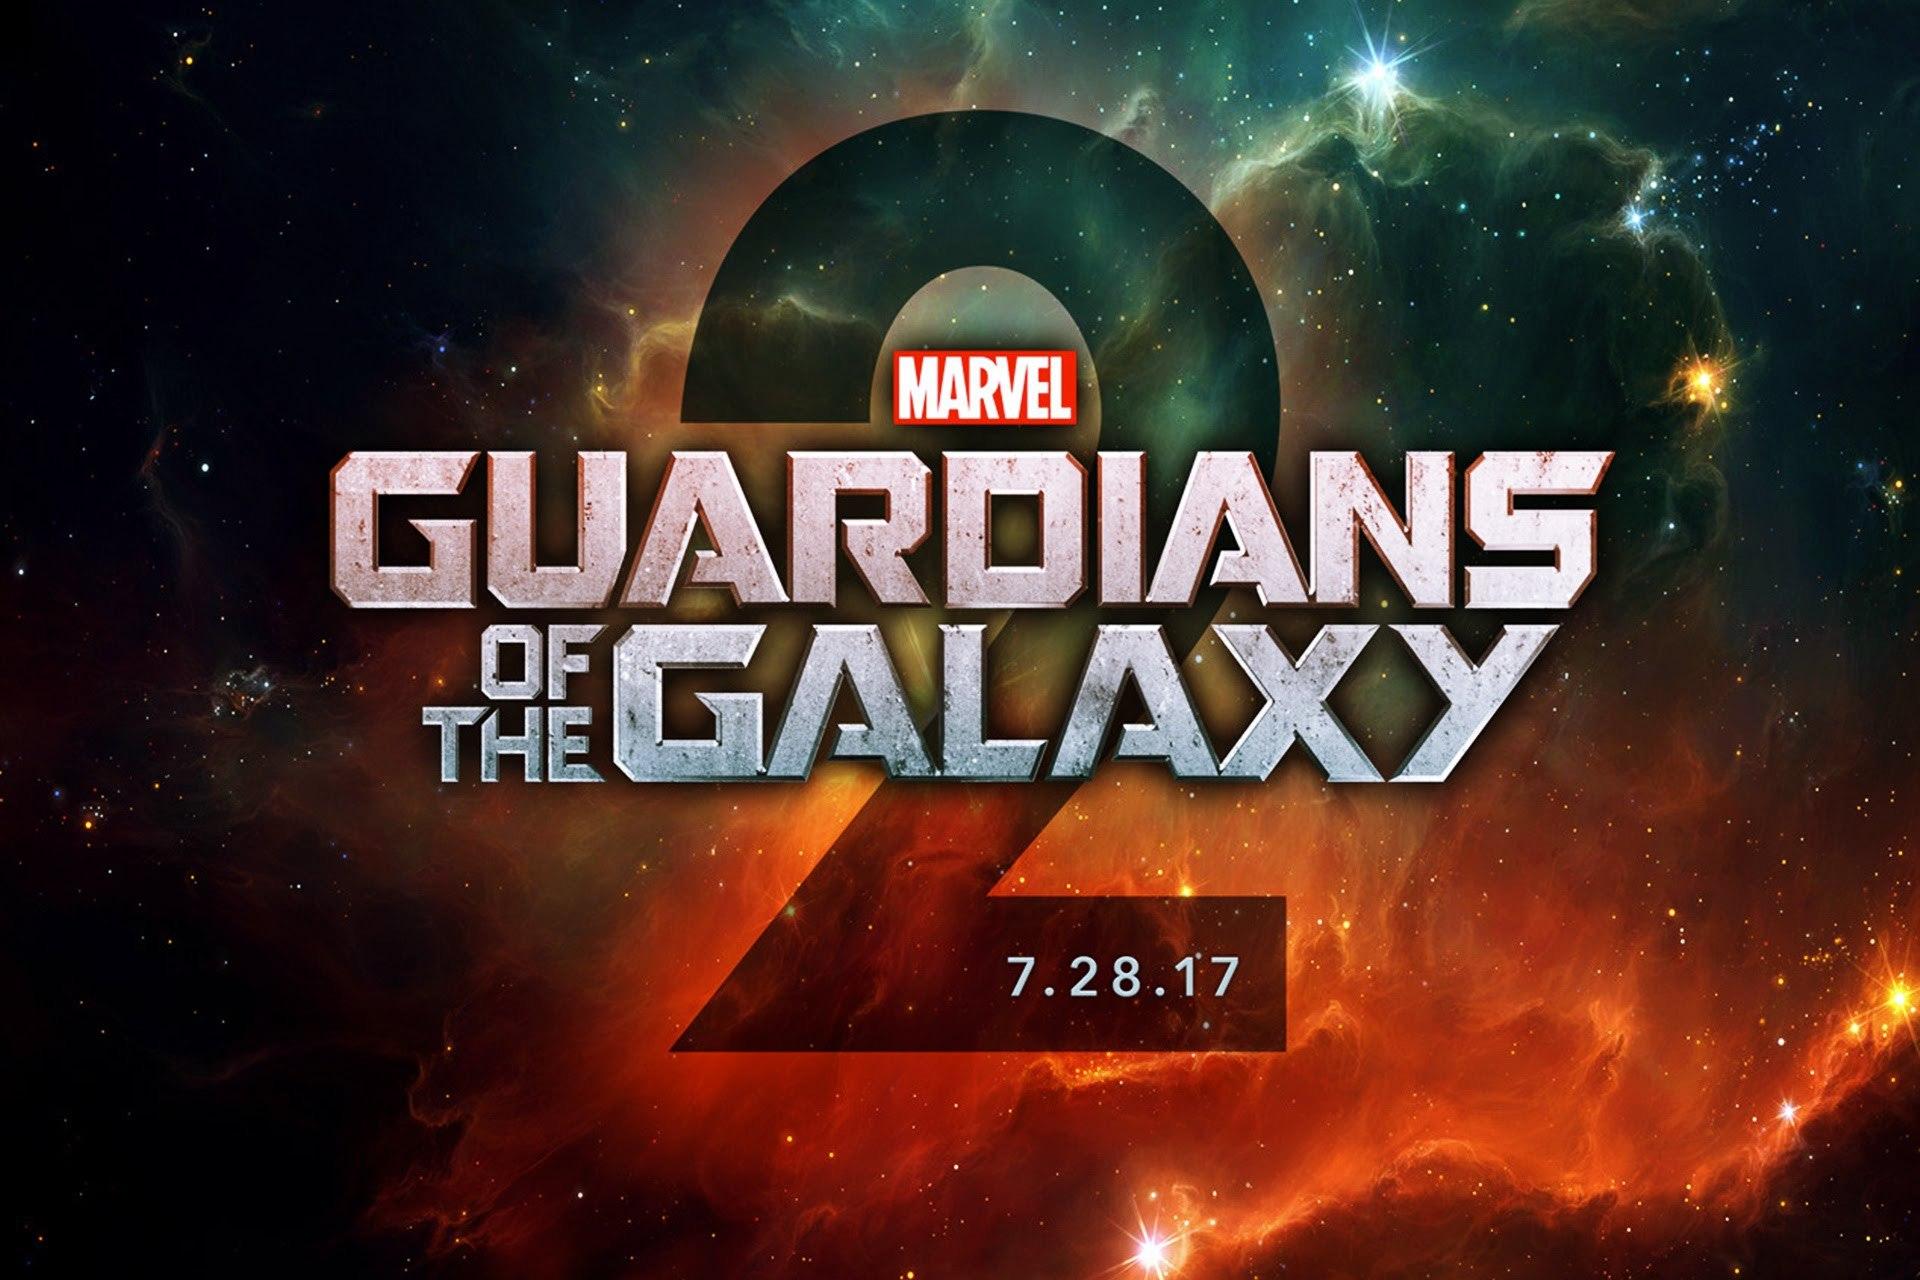 Guardians Of The Galaxy Vol. 2 Photos